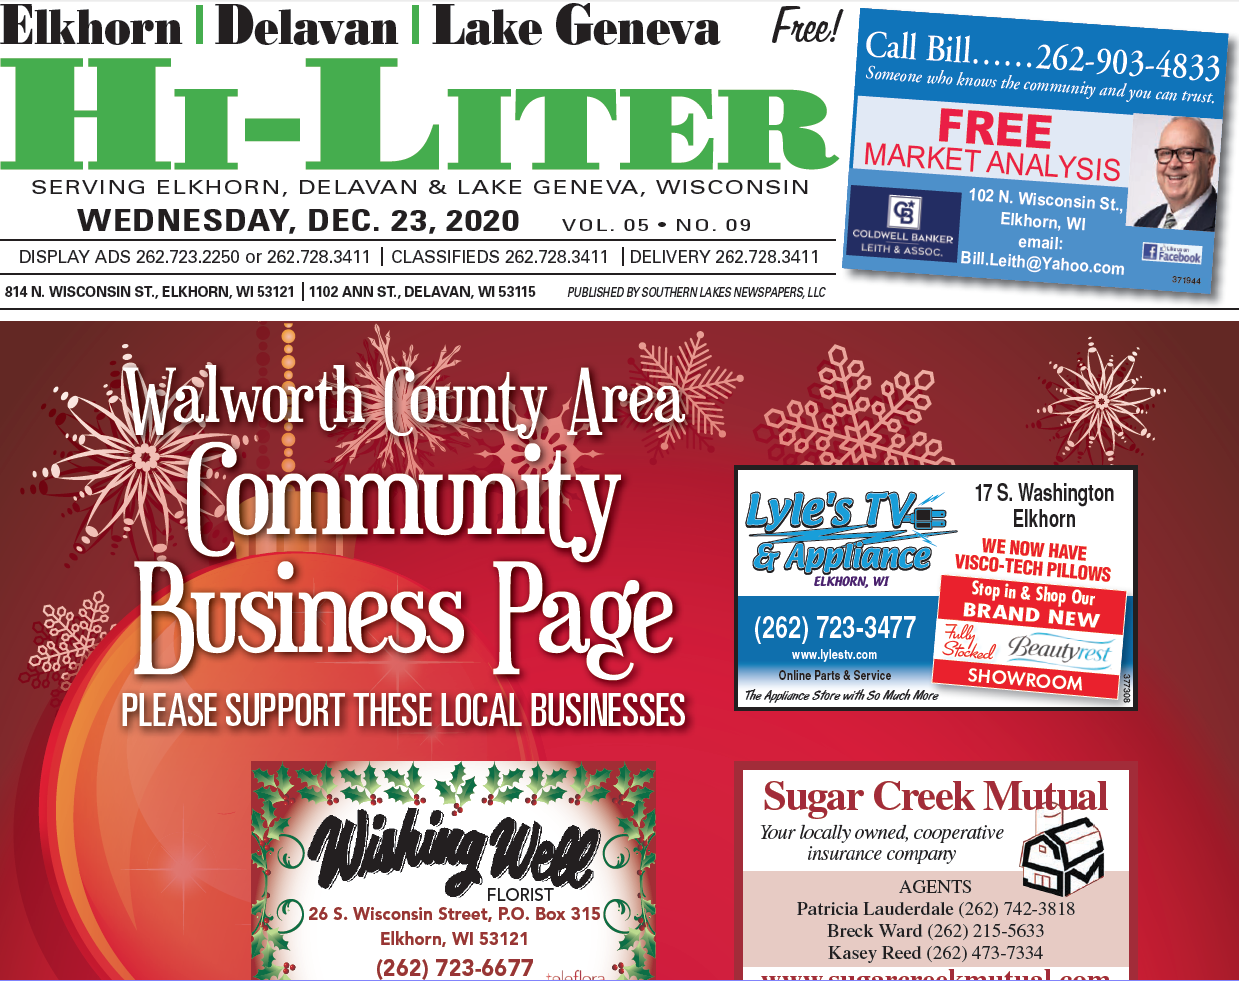 Hi-Liter Elkhorn/Delavan/Lake Geneva 12/23/2020